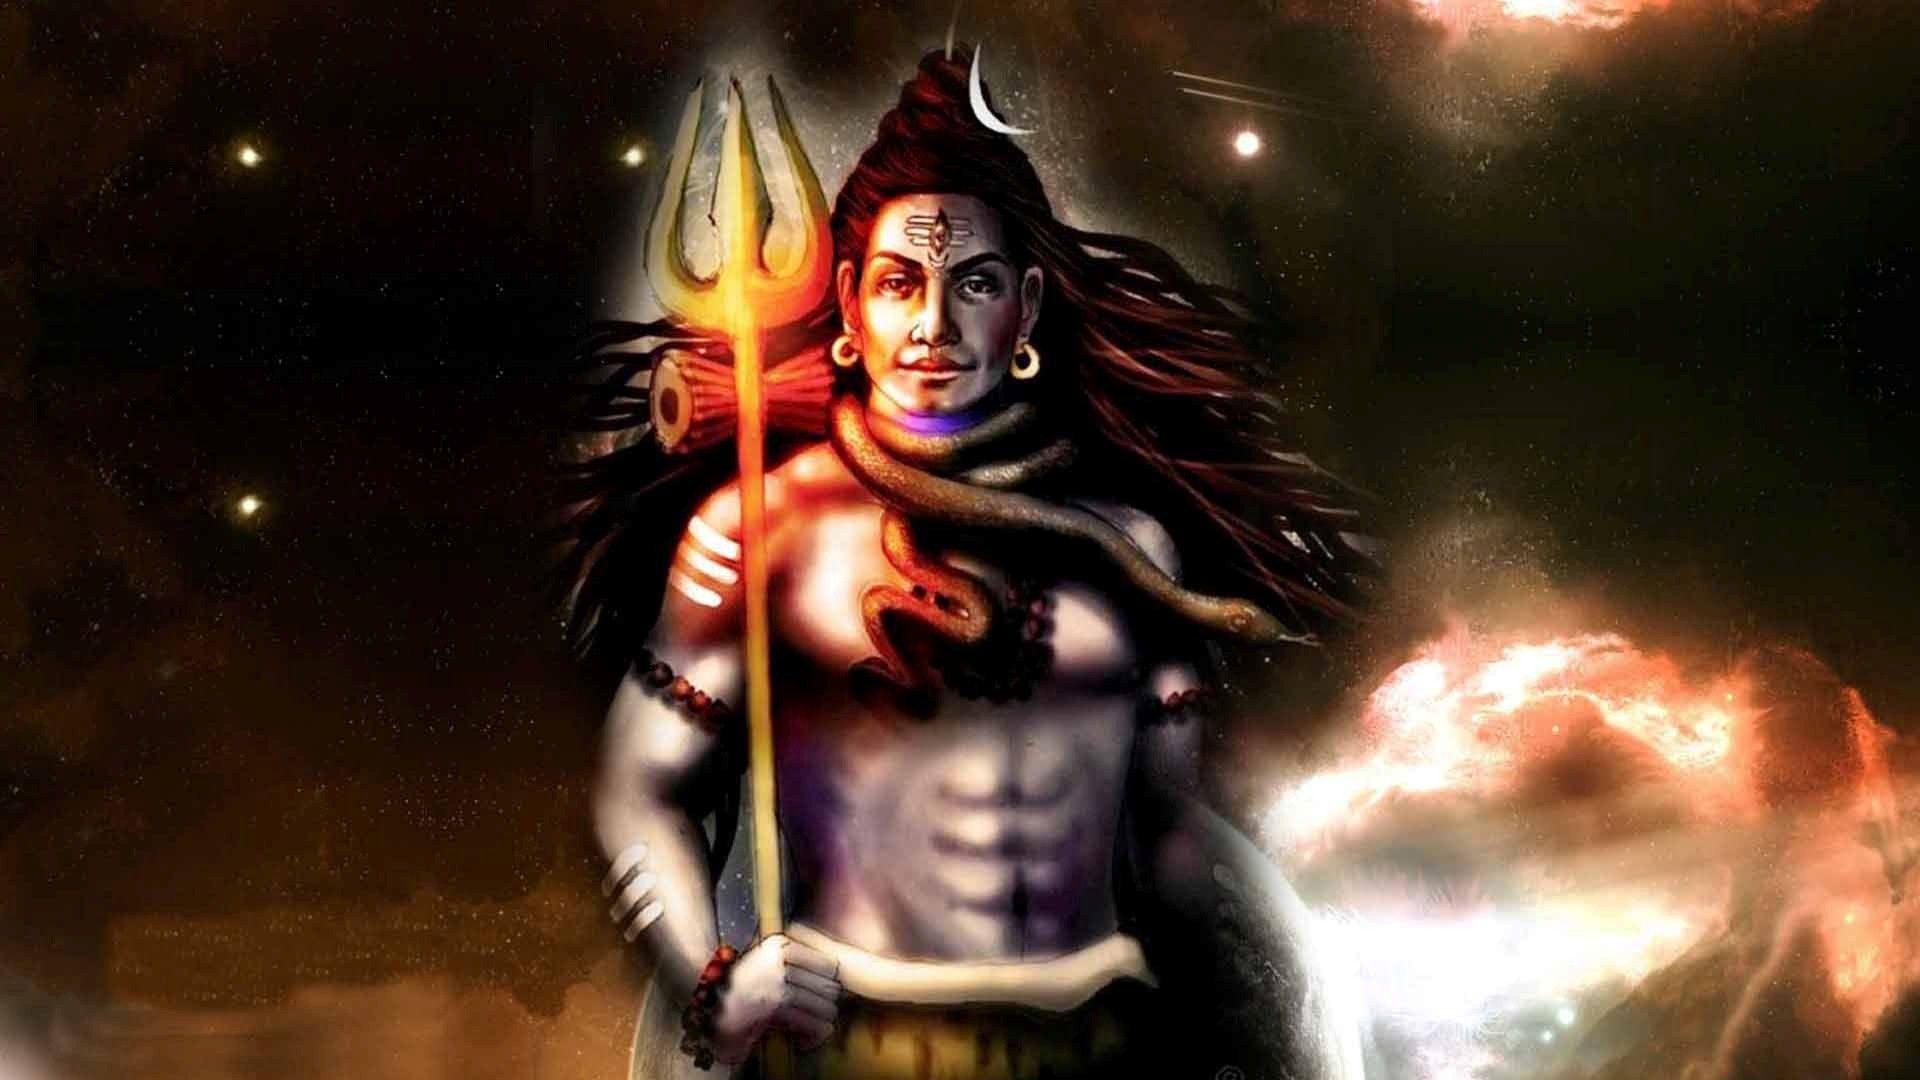 God Shiva Wallpaper - 3d Animated Lord Shiva - HD Wallpaper